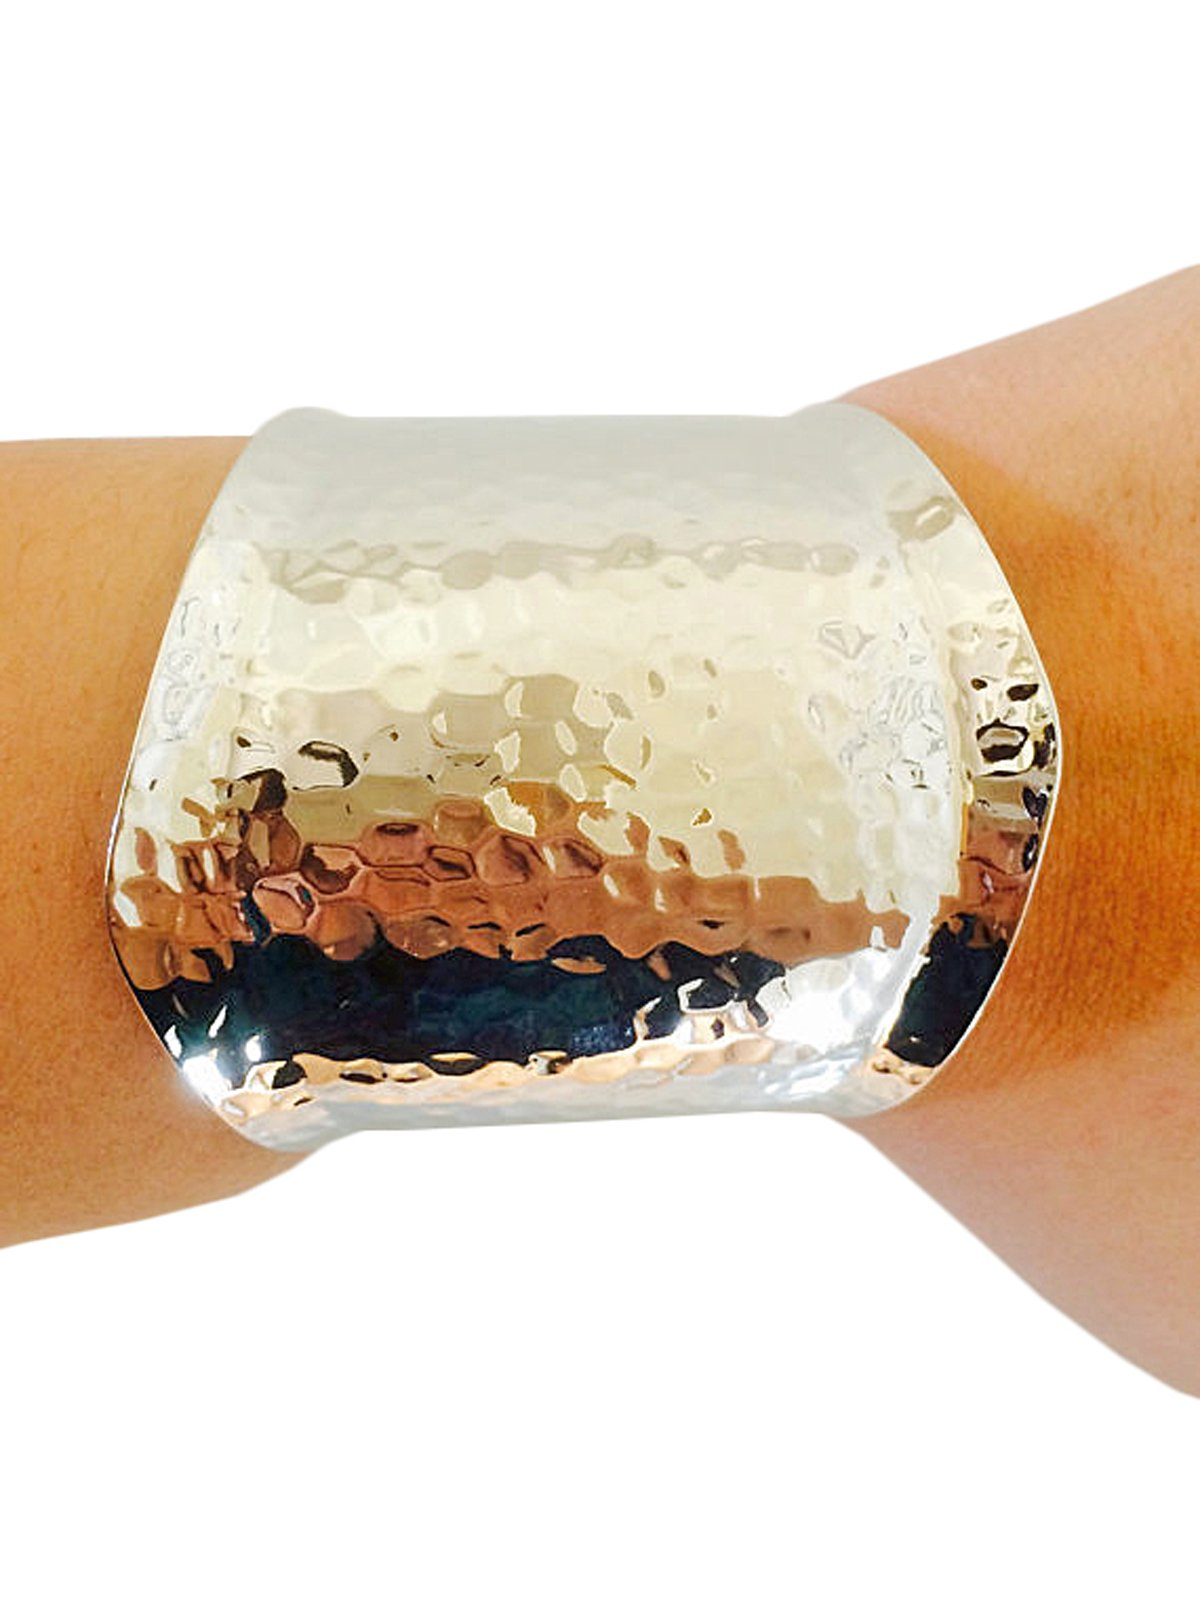 Fitbit Bracelet for Fitbit Flex - The LAURA Hammered Silver Cuff Fitbit Bracelet